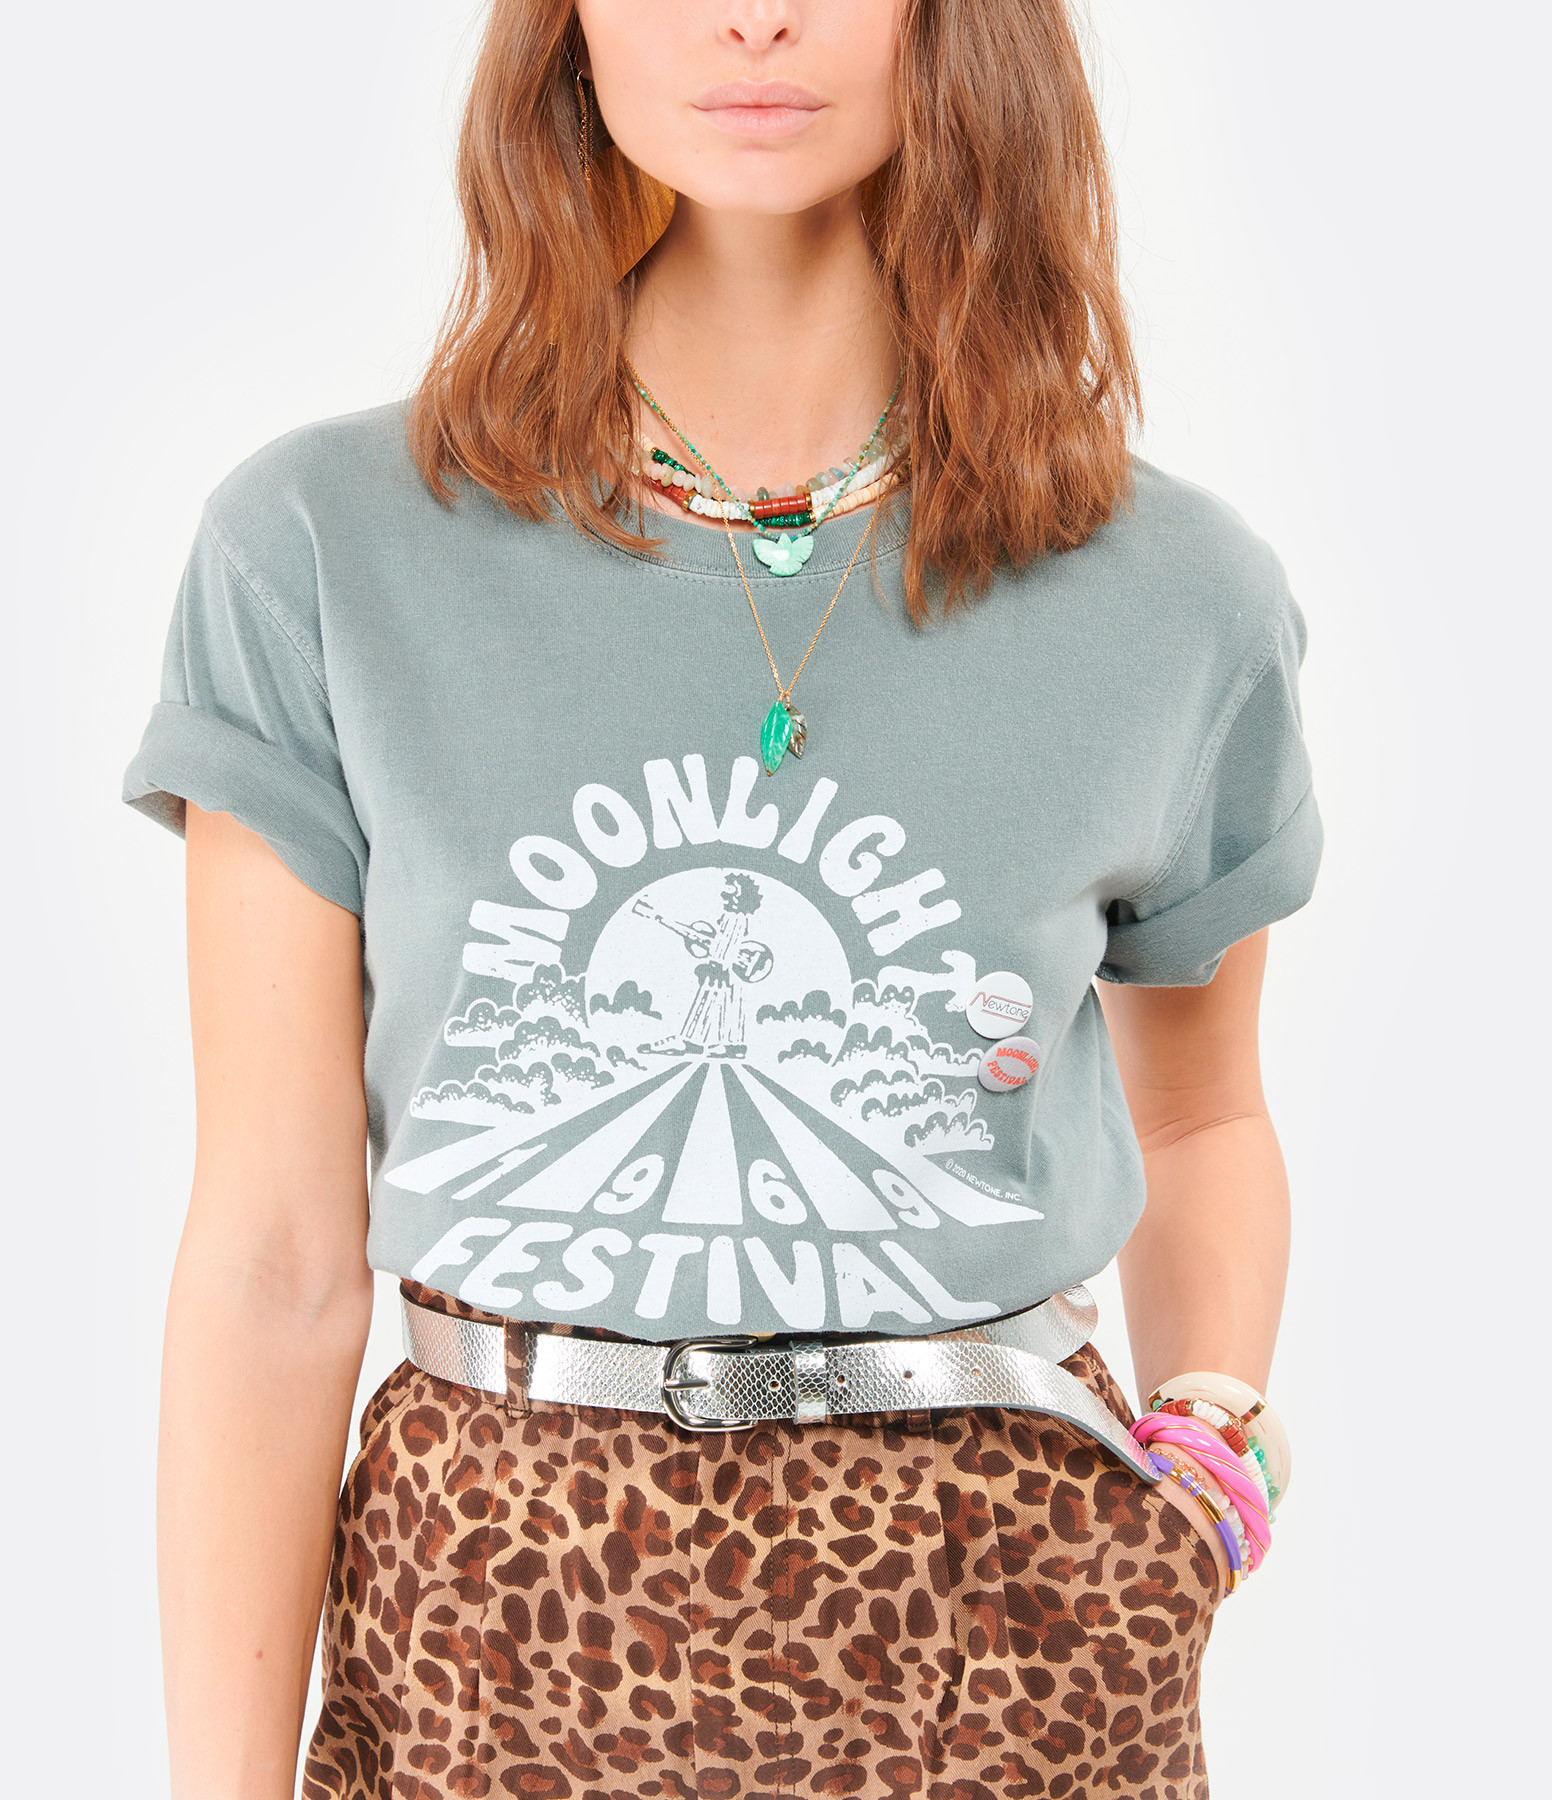 NEWTONE - Tee-shirt Trucker Moonlight Coton Gris